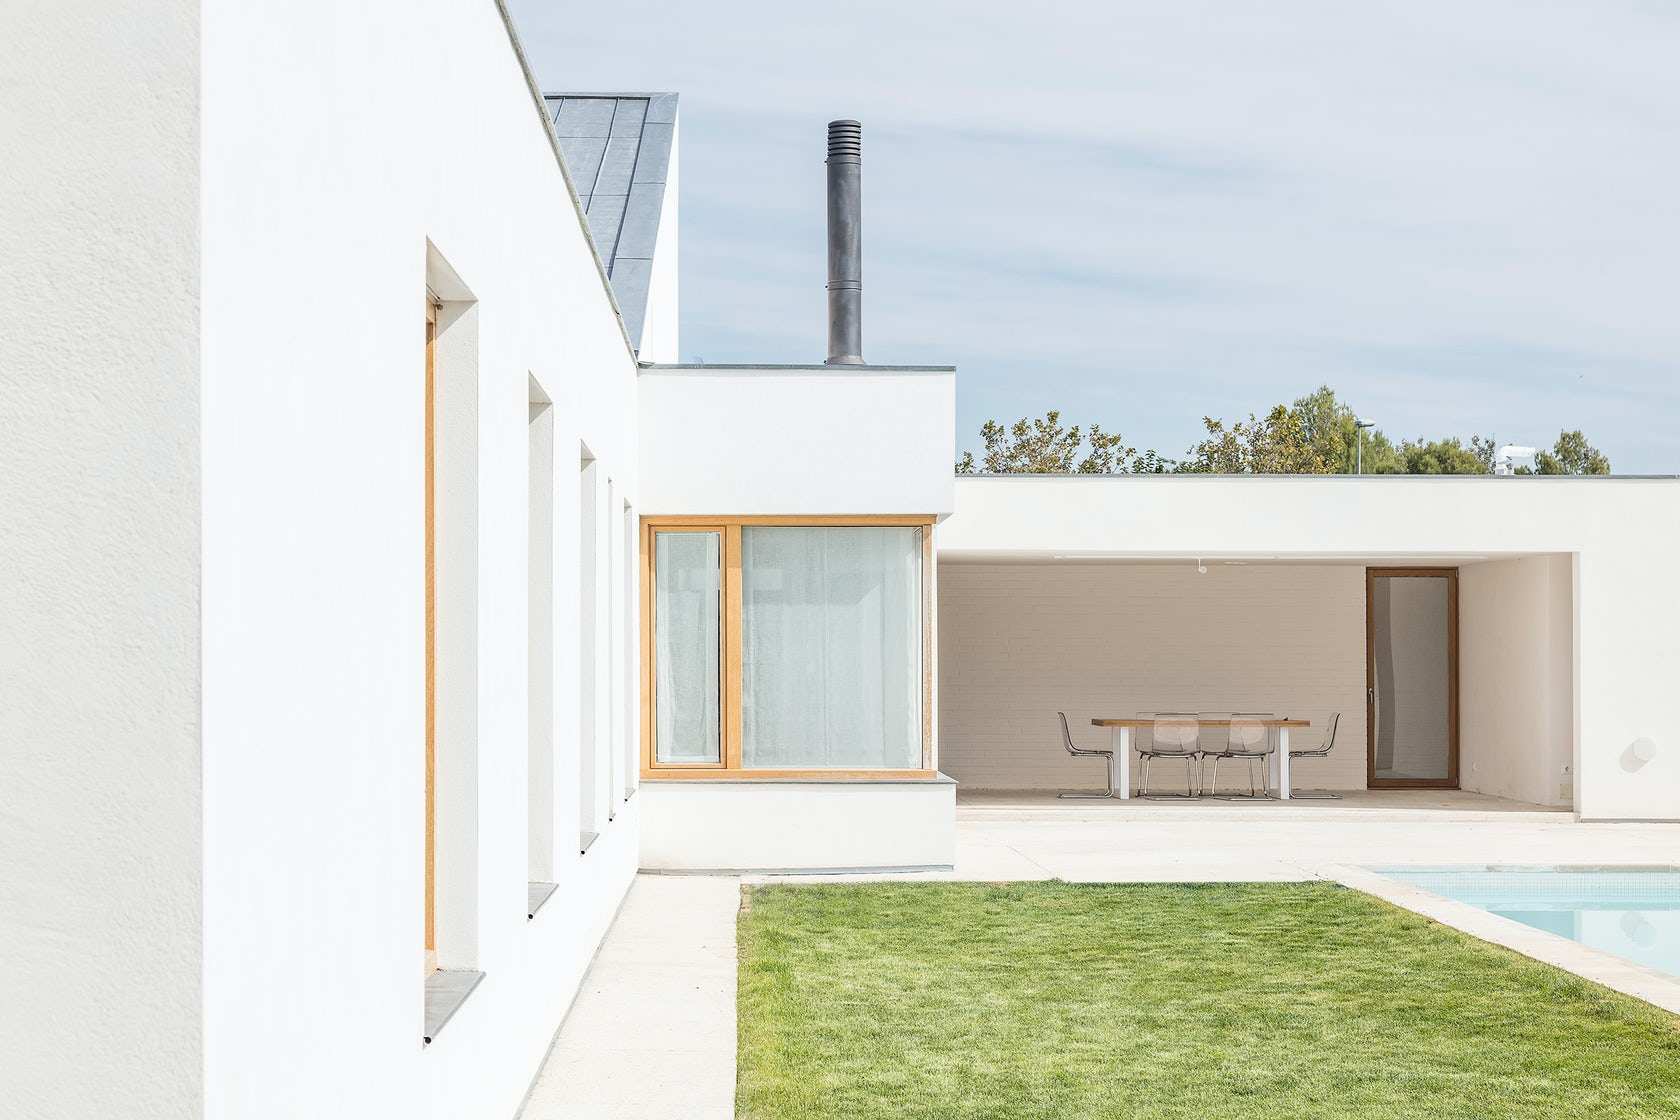 © Montse Zamorano | Architecture Photography